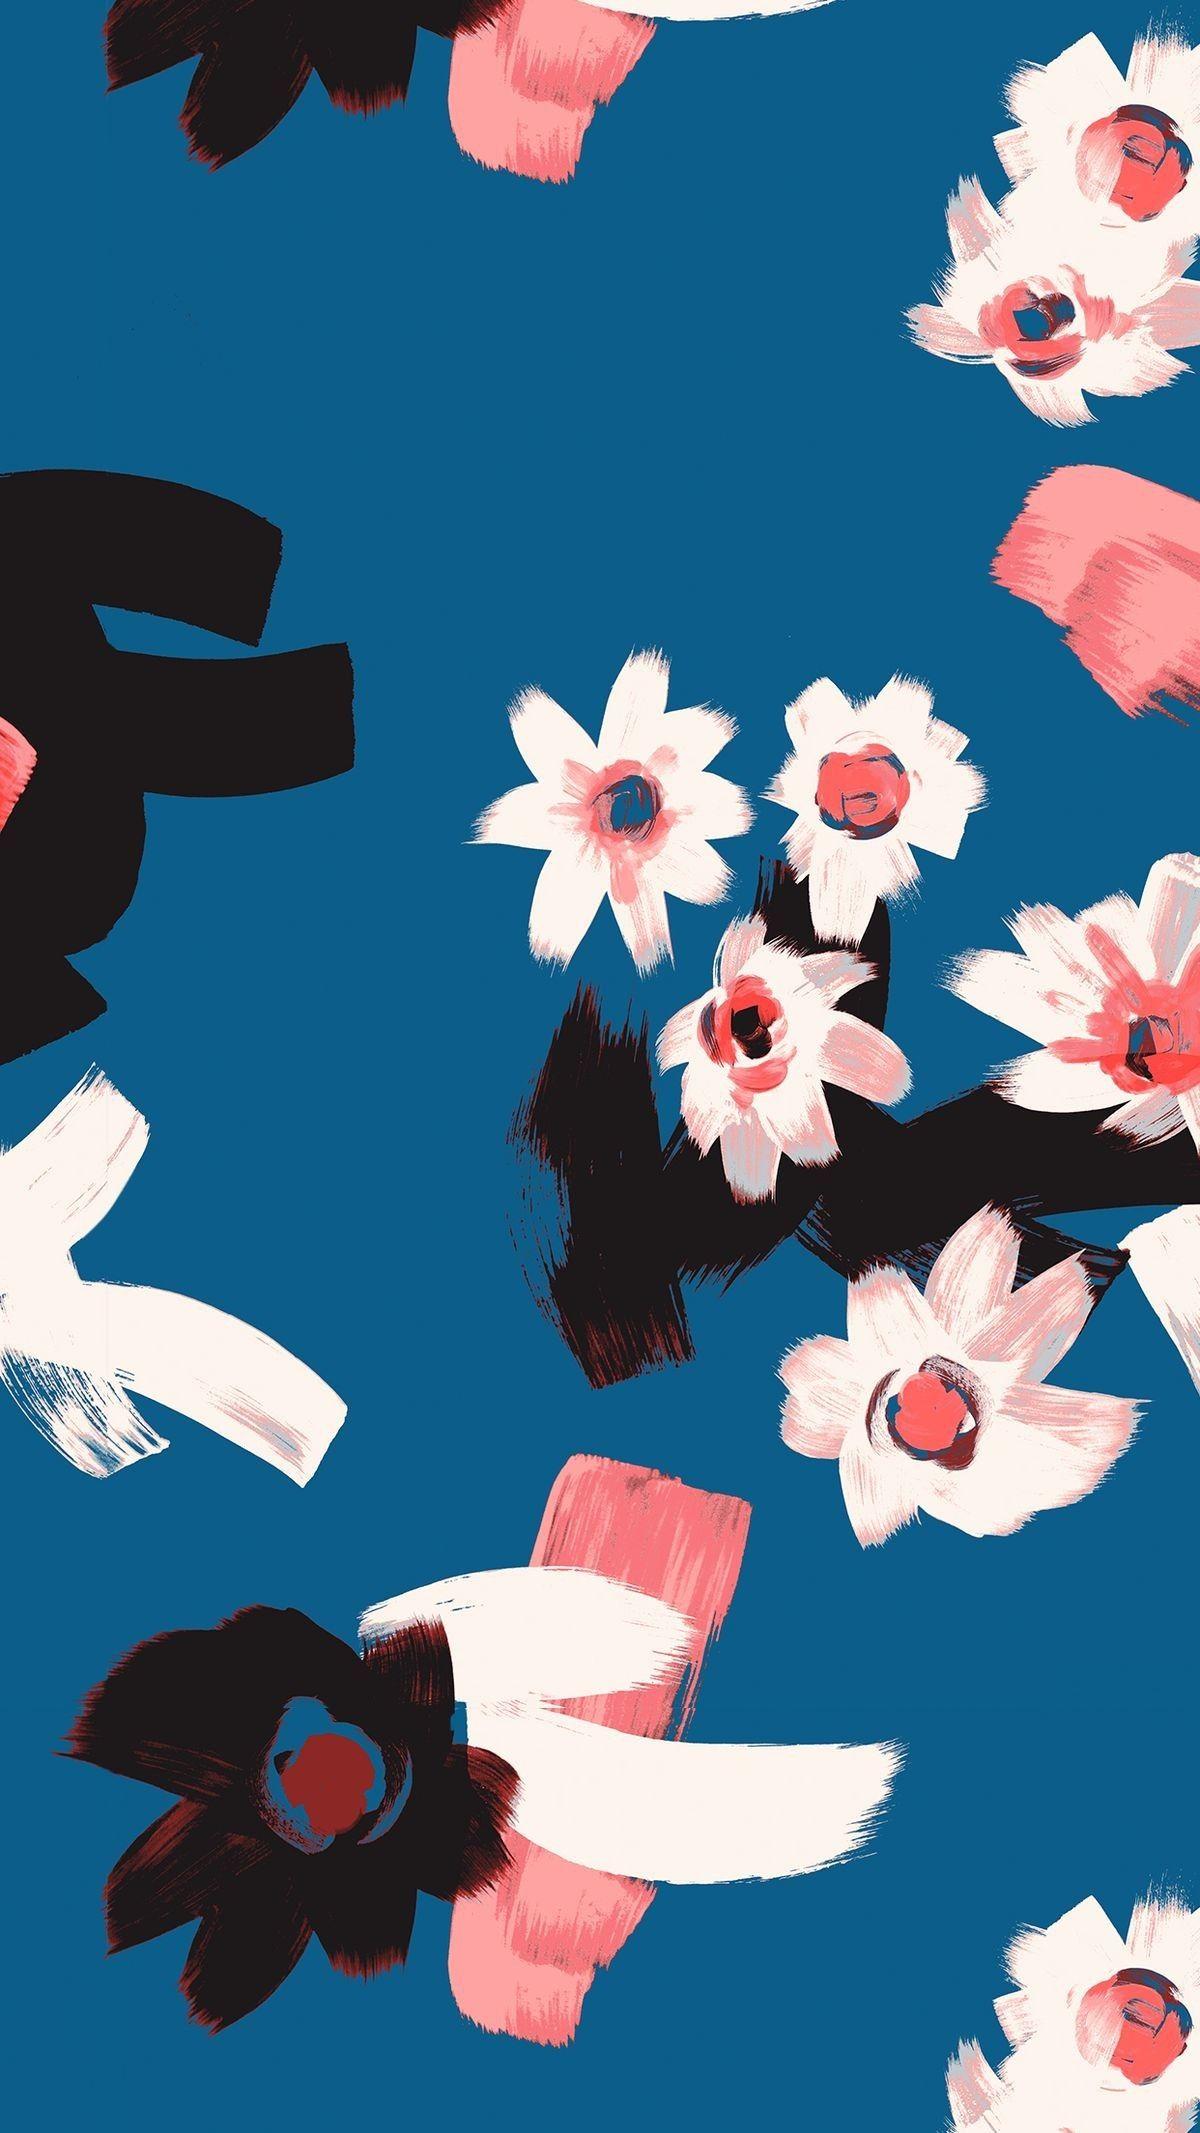 Pin by Tara Von on iPhone Xs Max Wallpaper Flower phone